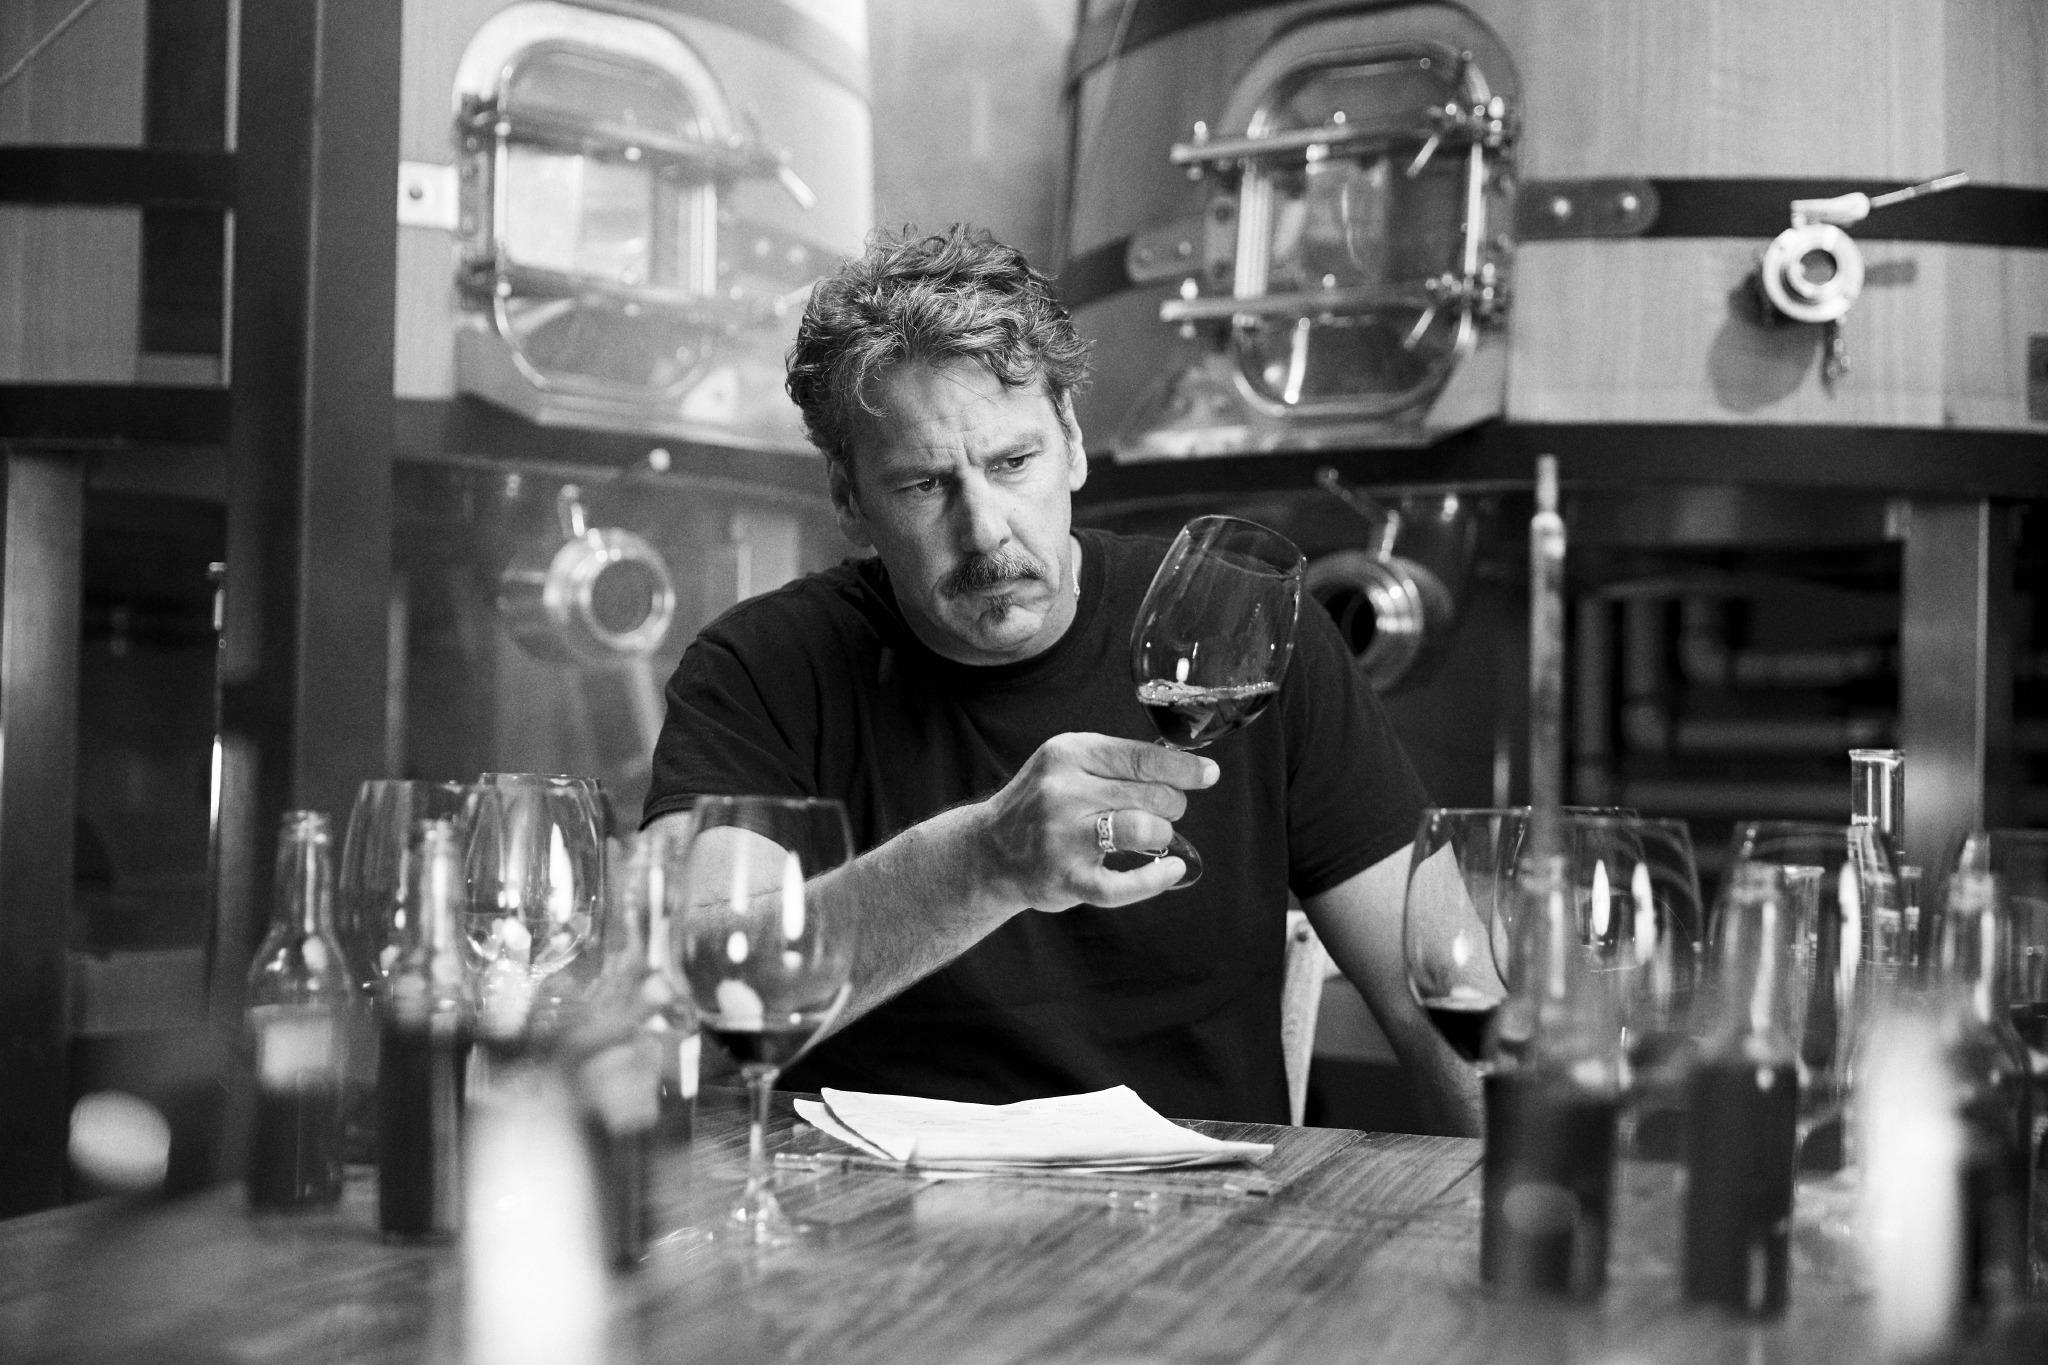 Superstar winemaker, Christopher Carpenter, crafts some stunning red wines at Cardinale.